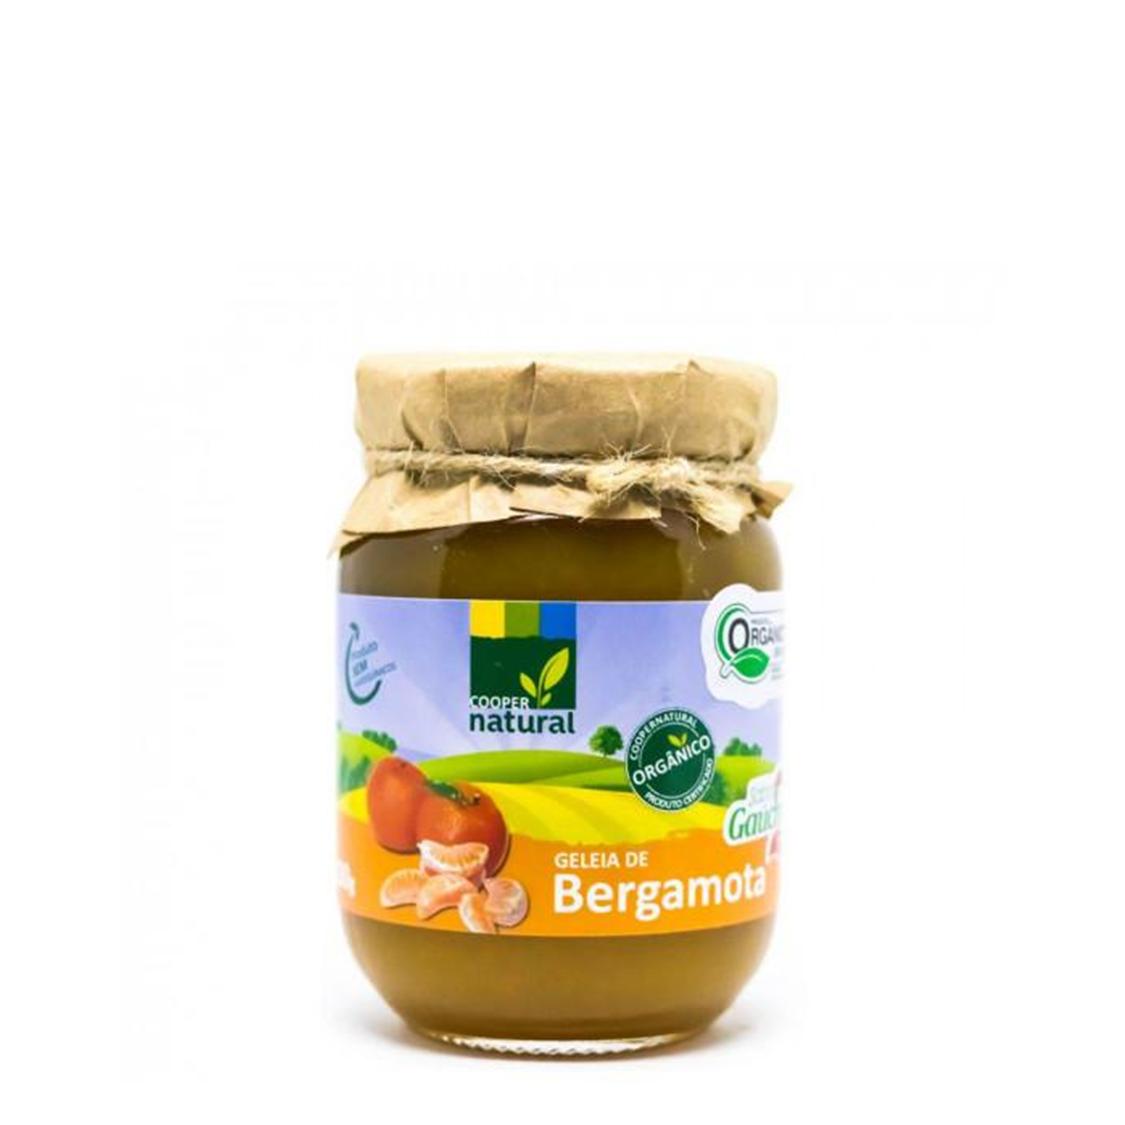 Geleia de Bergamota – 300g – Coopernatural